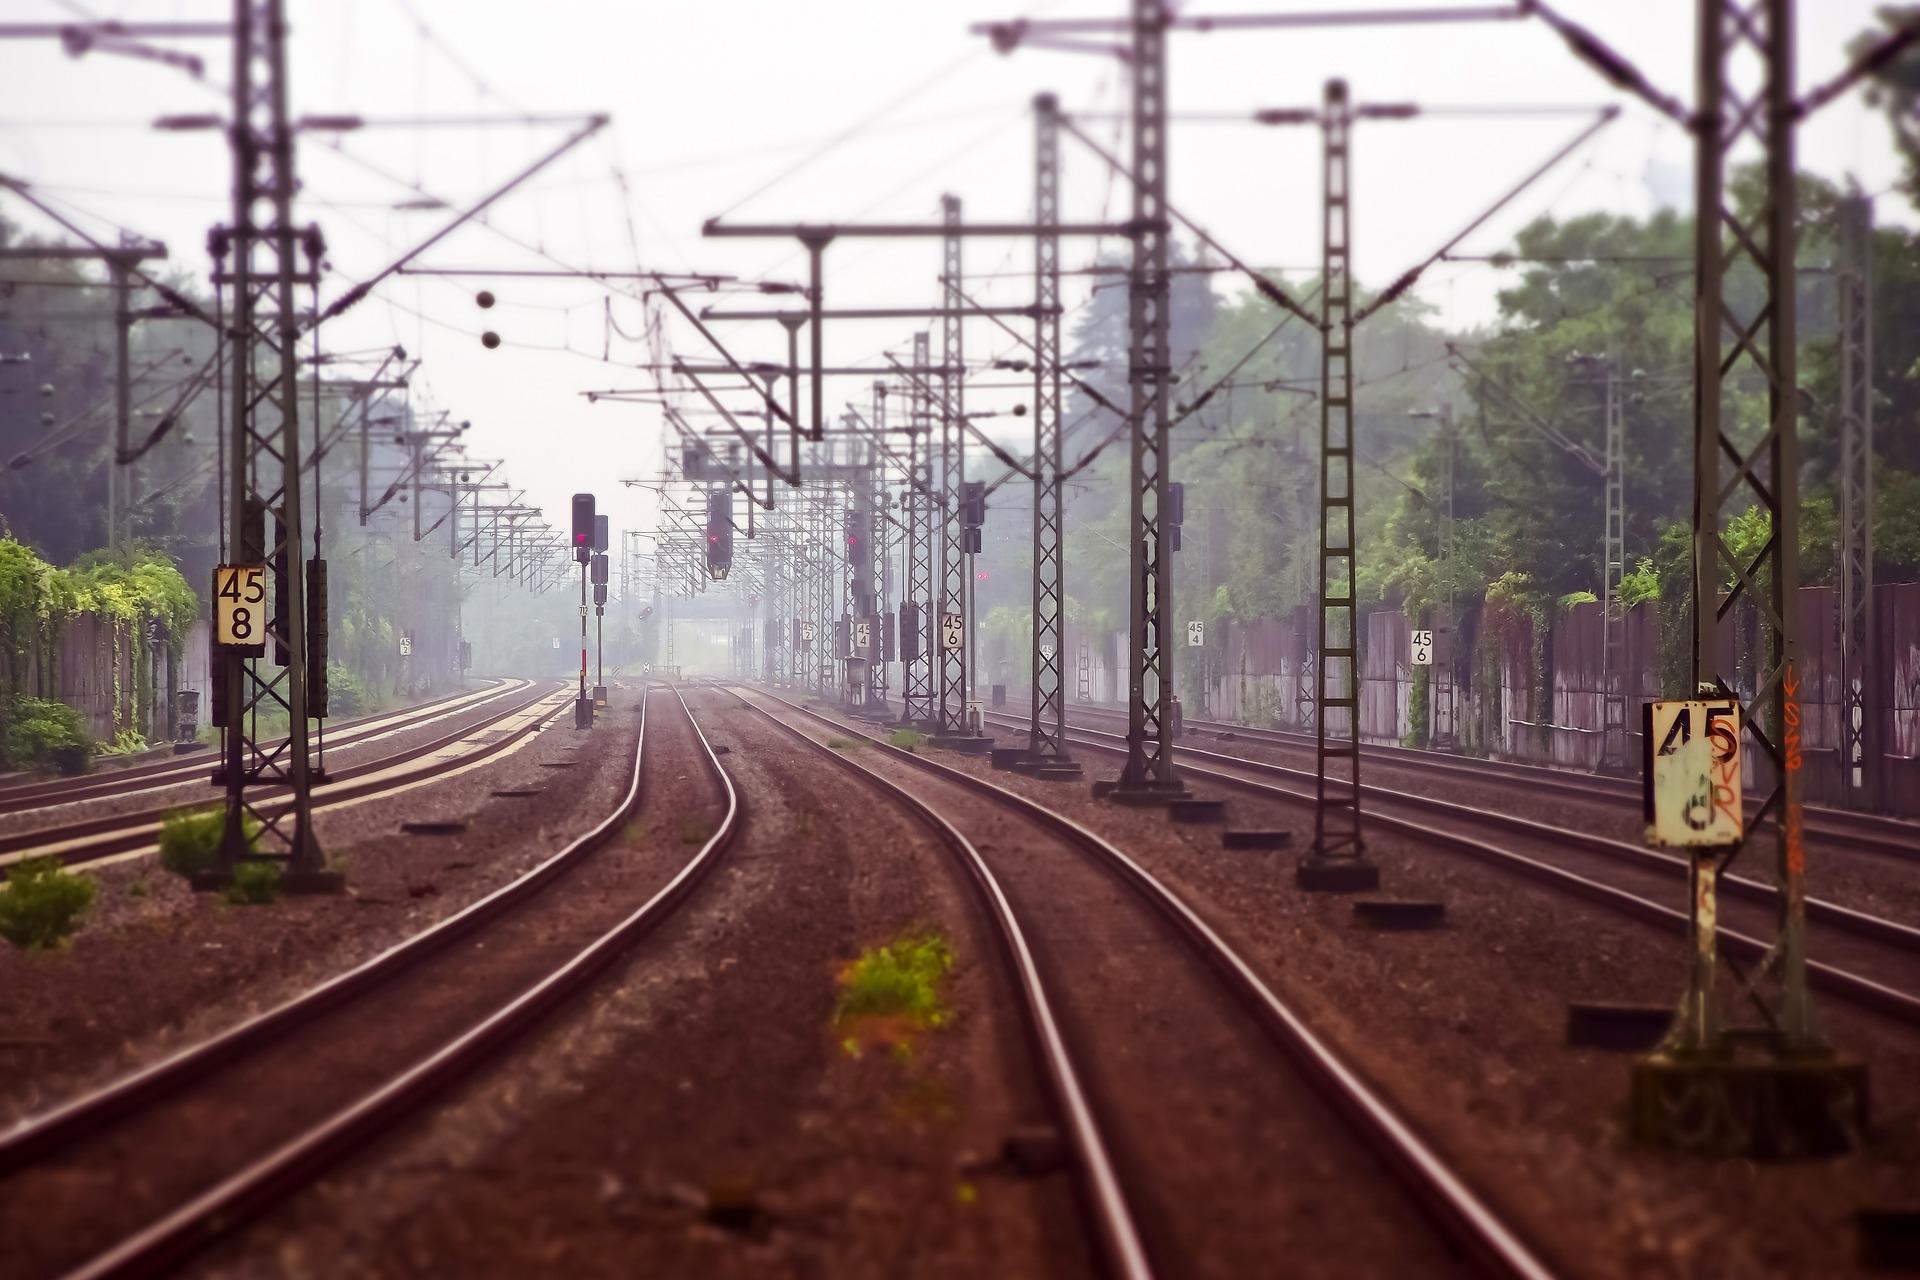 railway-tracks-3455169_1920